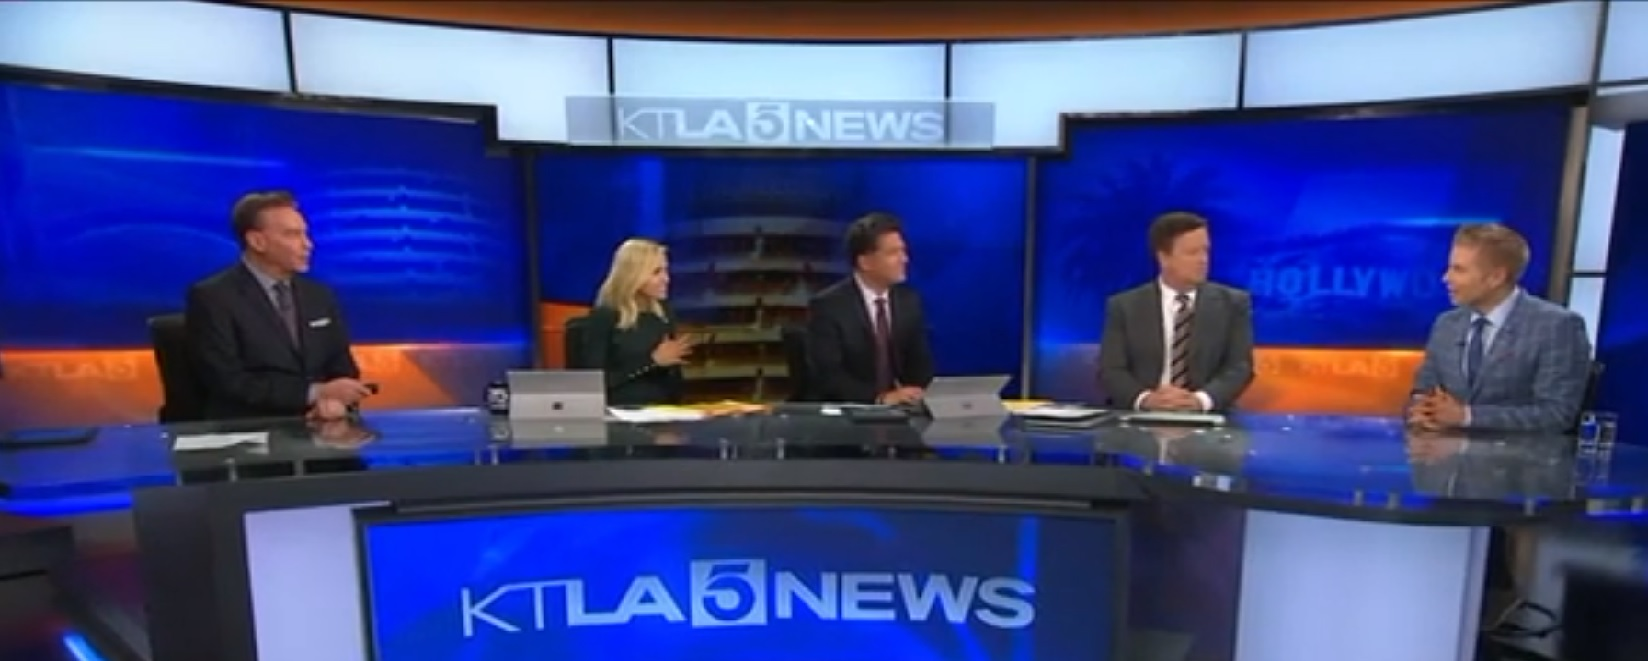 How Bad will the Tax Reform Screw Californians? KTLA News Video